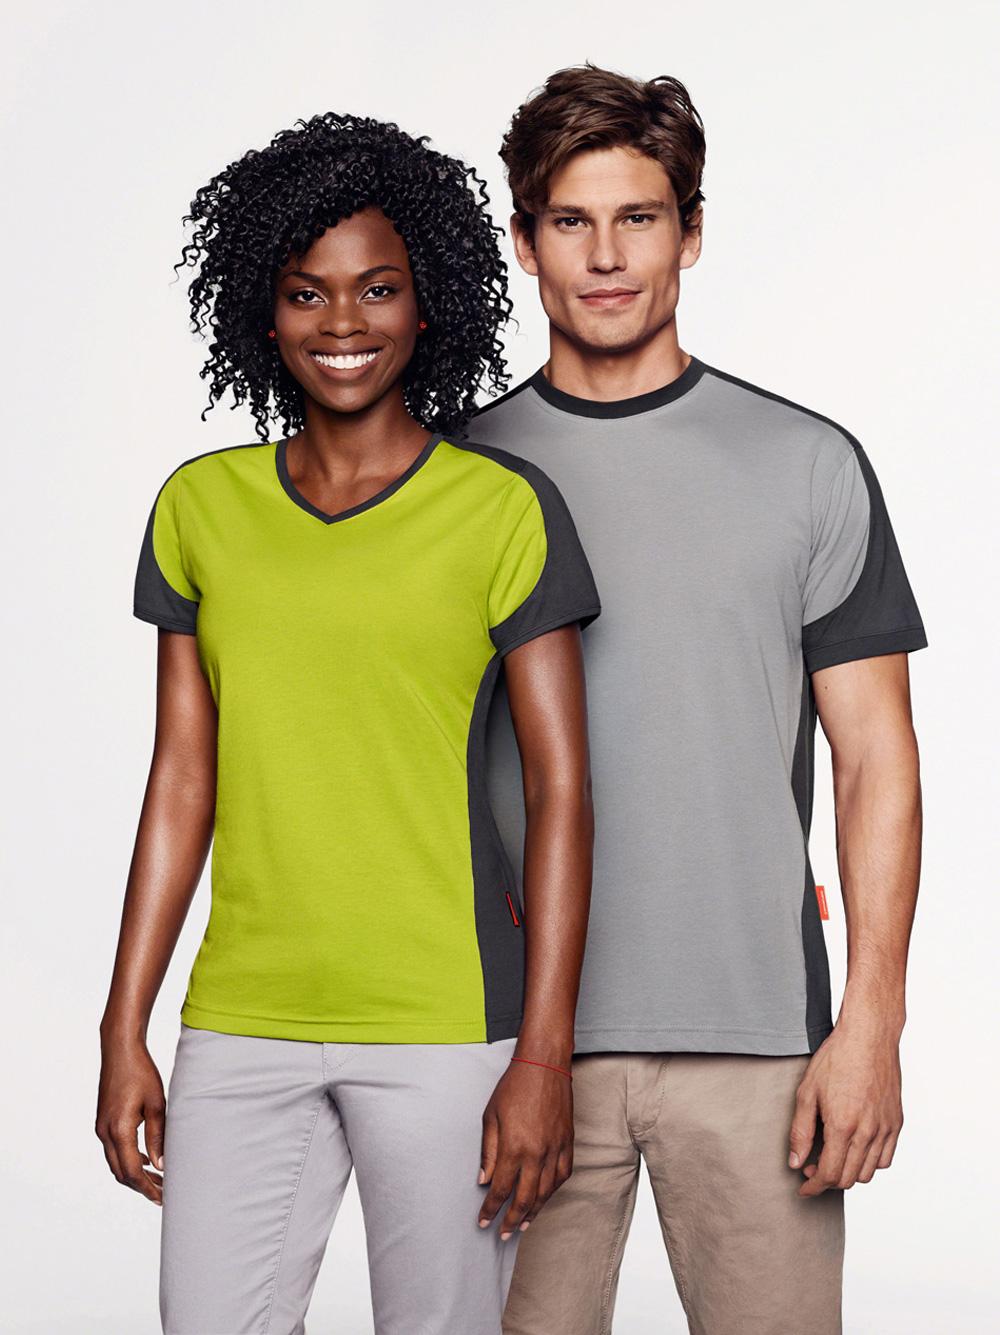 Hakro 290: T-Shirt Performance Contrast